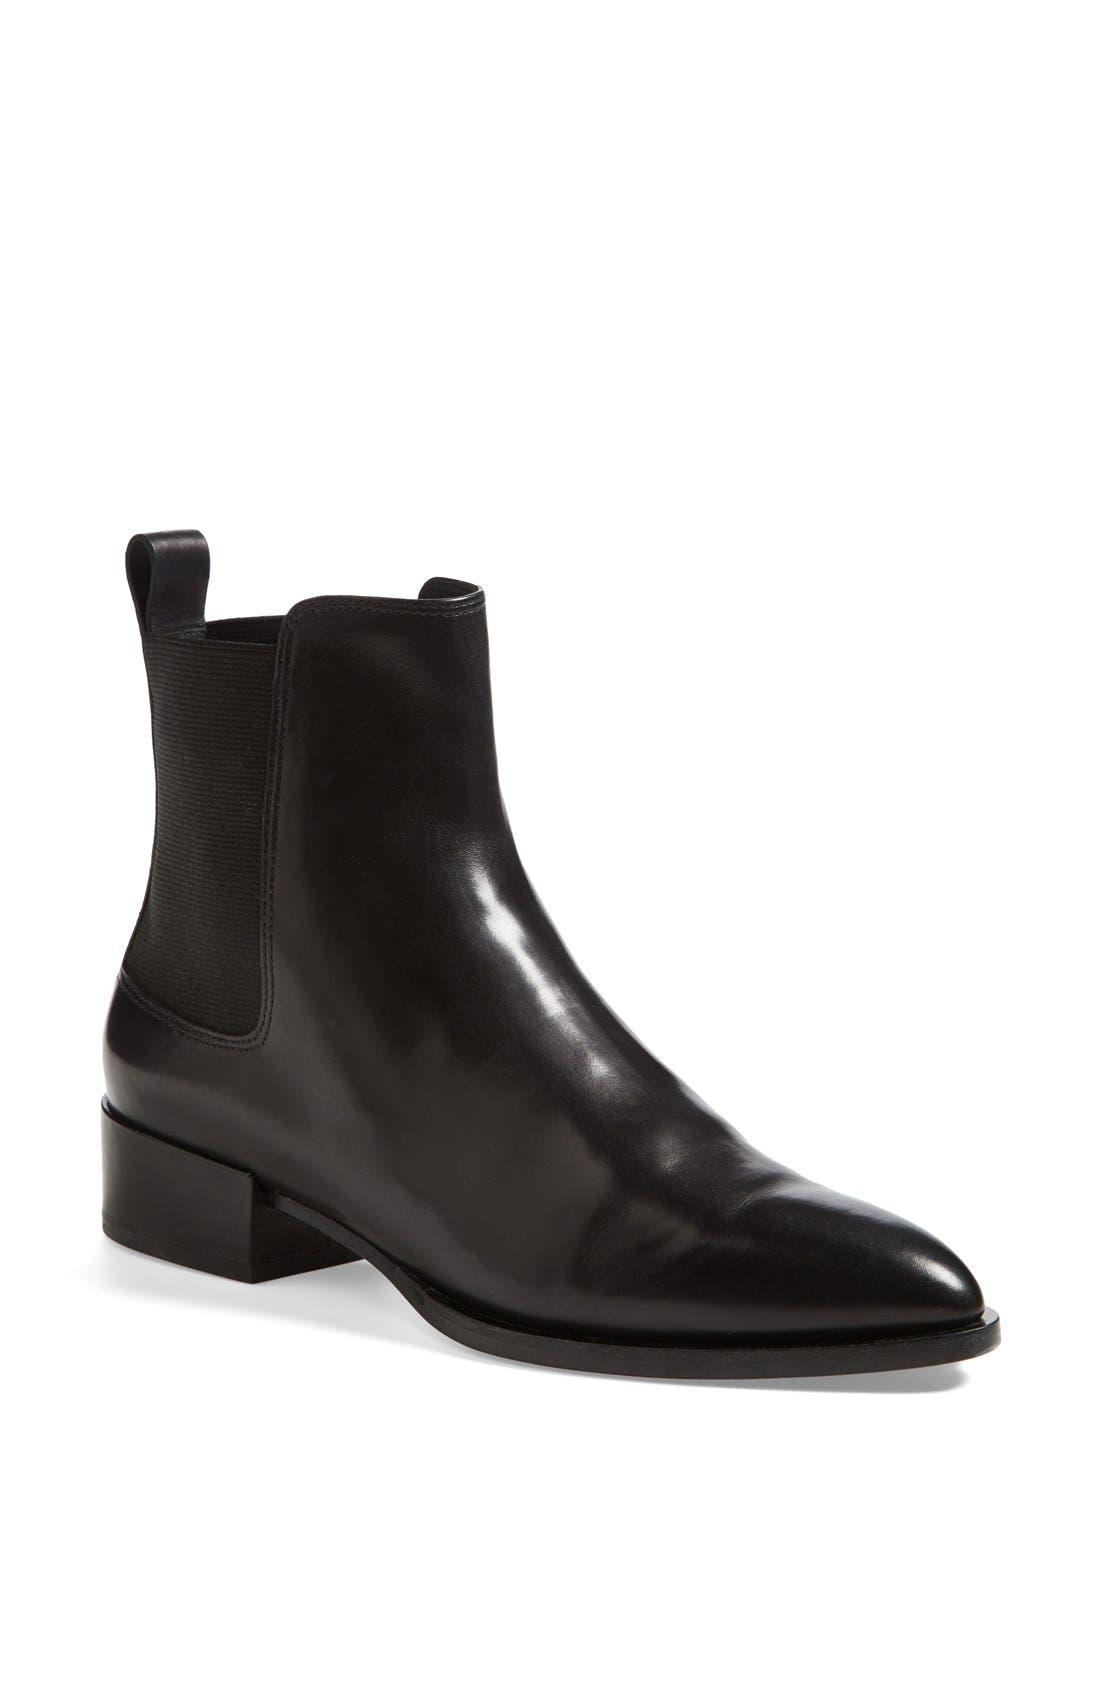 'Yarmon' Almond Toe Calfskin Leather Chelsea Boot,                             Main thumbnail 1, color,                             002